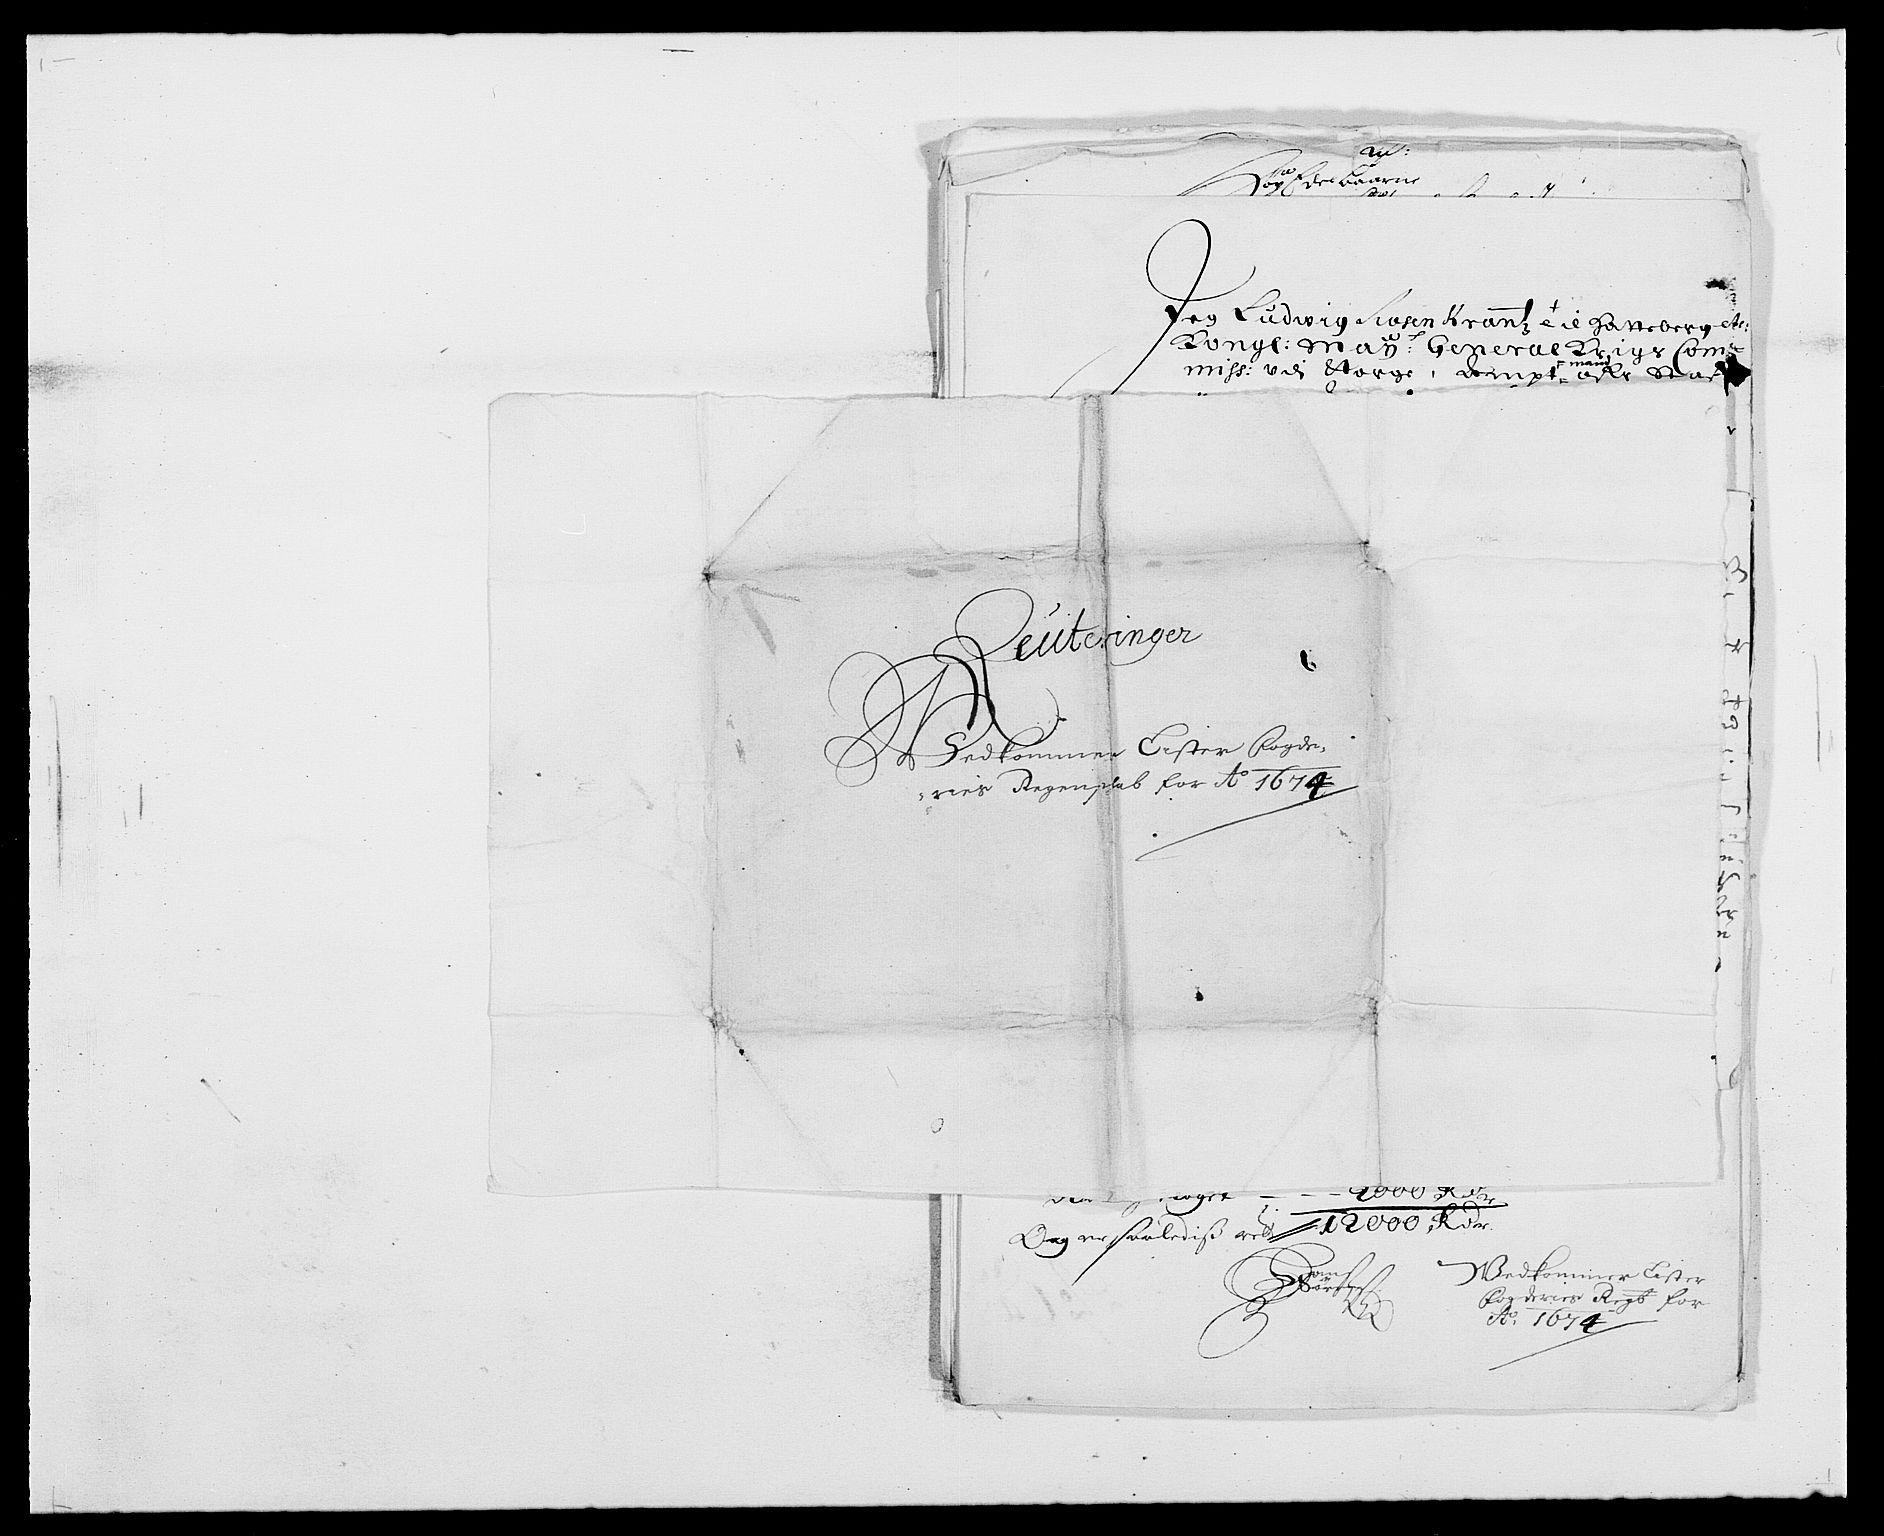 RA, Rentekammeret inntil 1814, Reviderte regnskaper, Fogderegnskap, R41/L2528: Fogderegnskap Lista, 1673-1674, s. 283